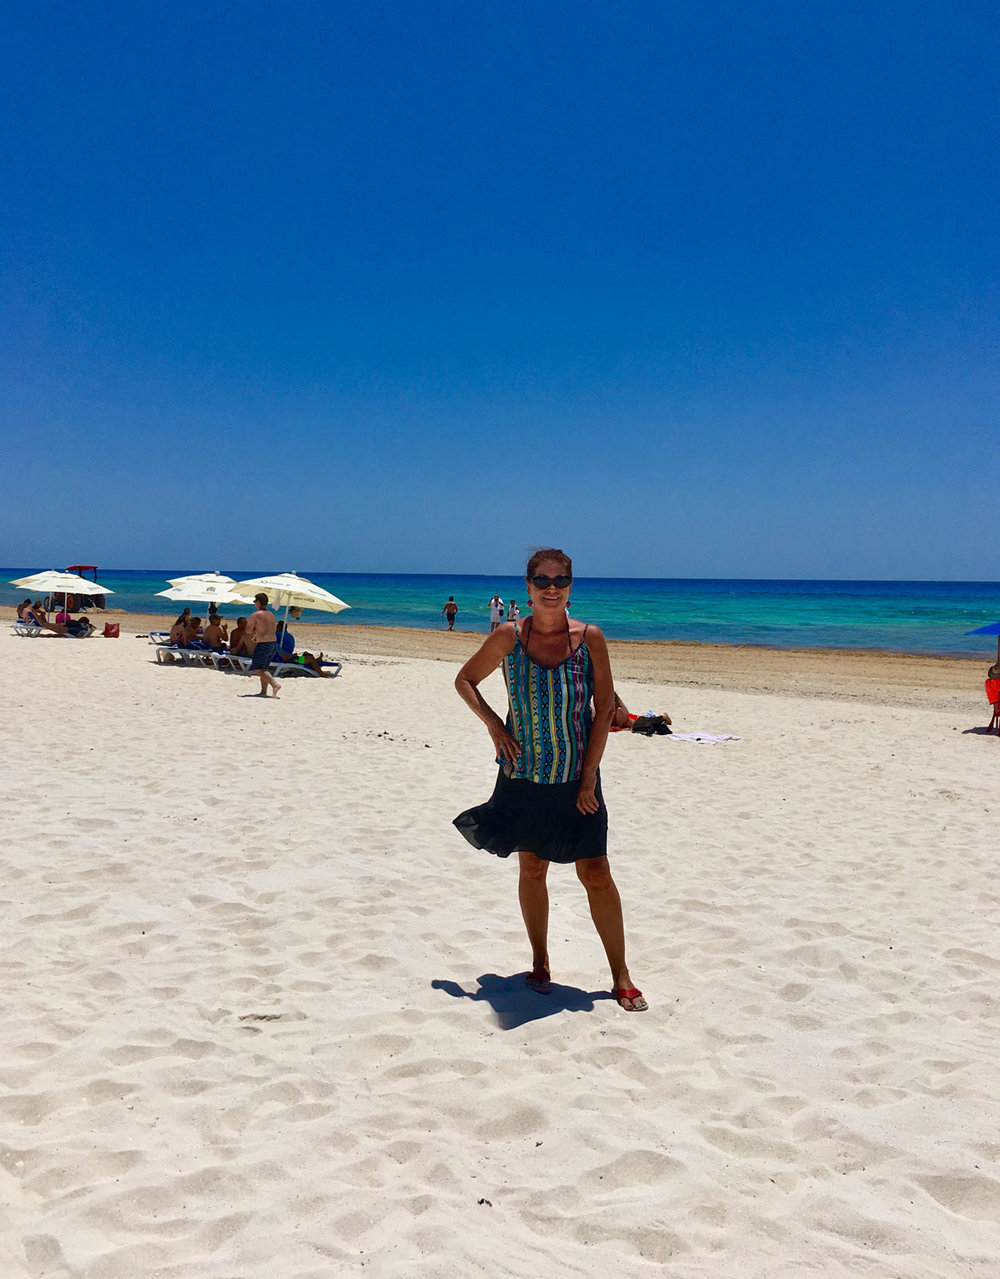 Hammocks_and_Ruins_Blog_Riviera_Maya_Mexico_Travel_Discover_Explore_Yucatan_Hammocks_Beaches_Near_Cancun_Playa_Marlin_2.jpg